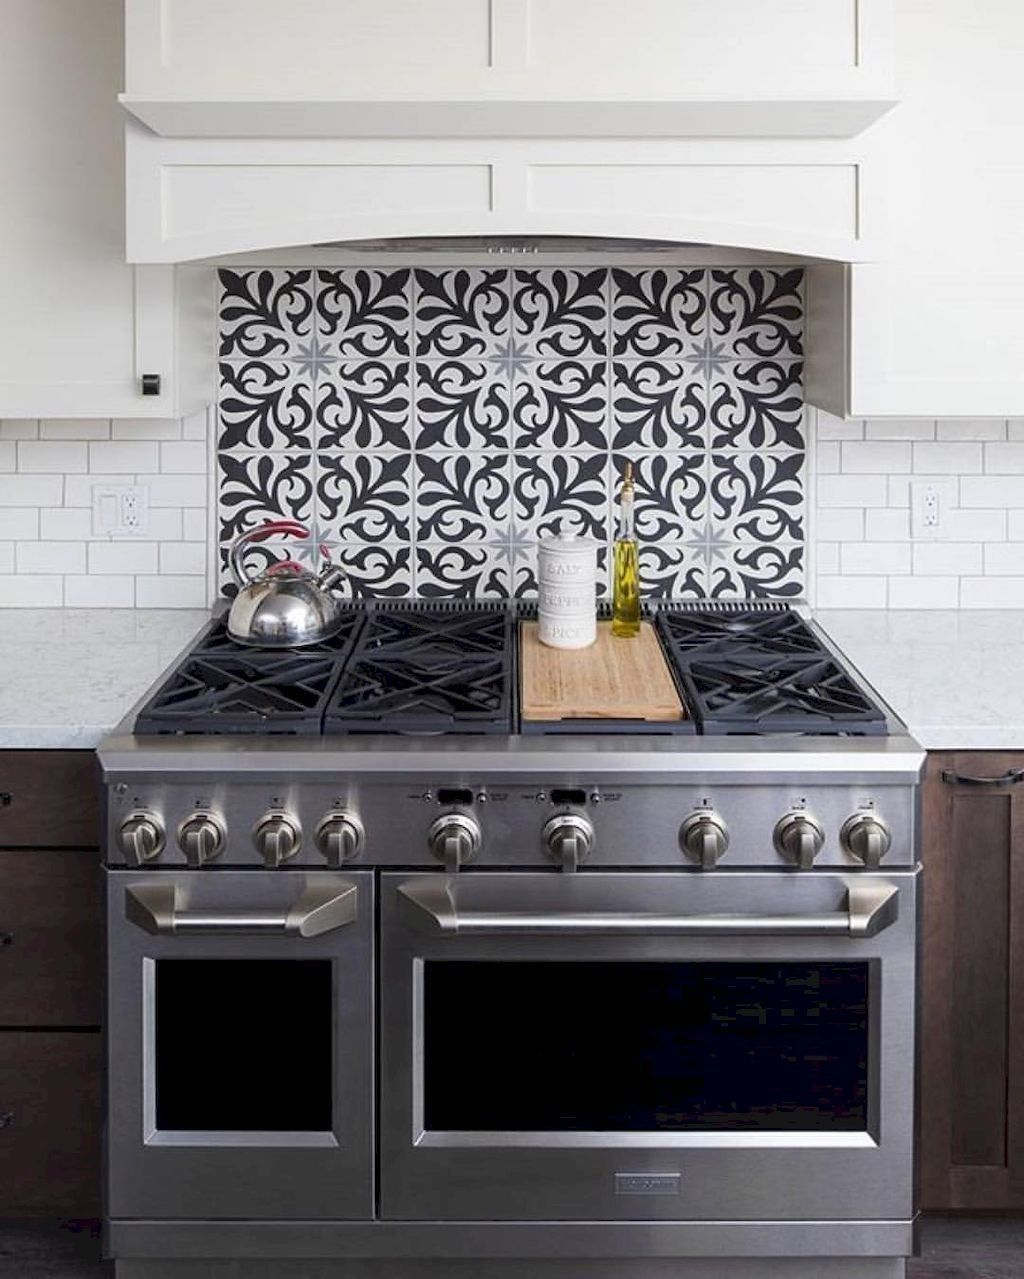 Popular Modern Farmhouse Kitchen Backsplash Ideas 09 Yeni Mutfak Modelleri Mutfak Yenileme Mutfak Tasarimlari